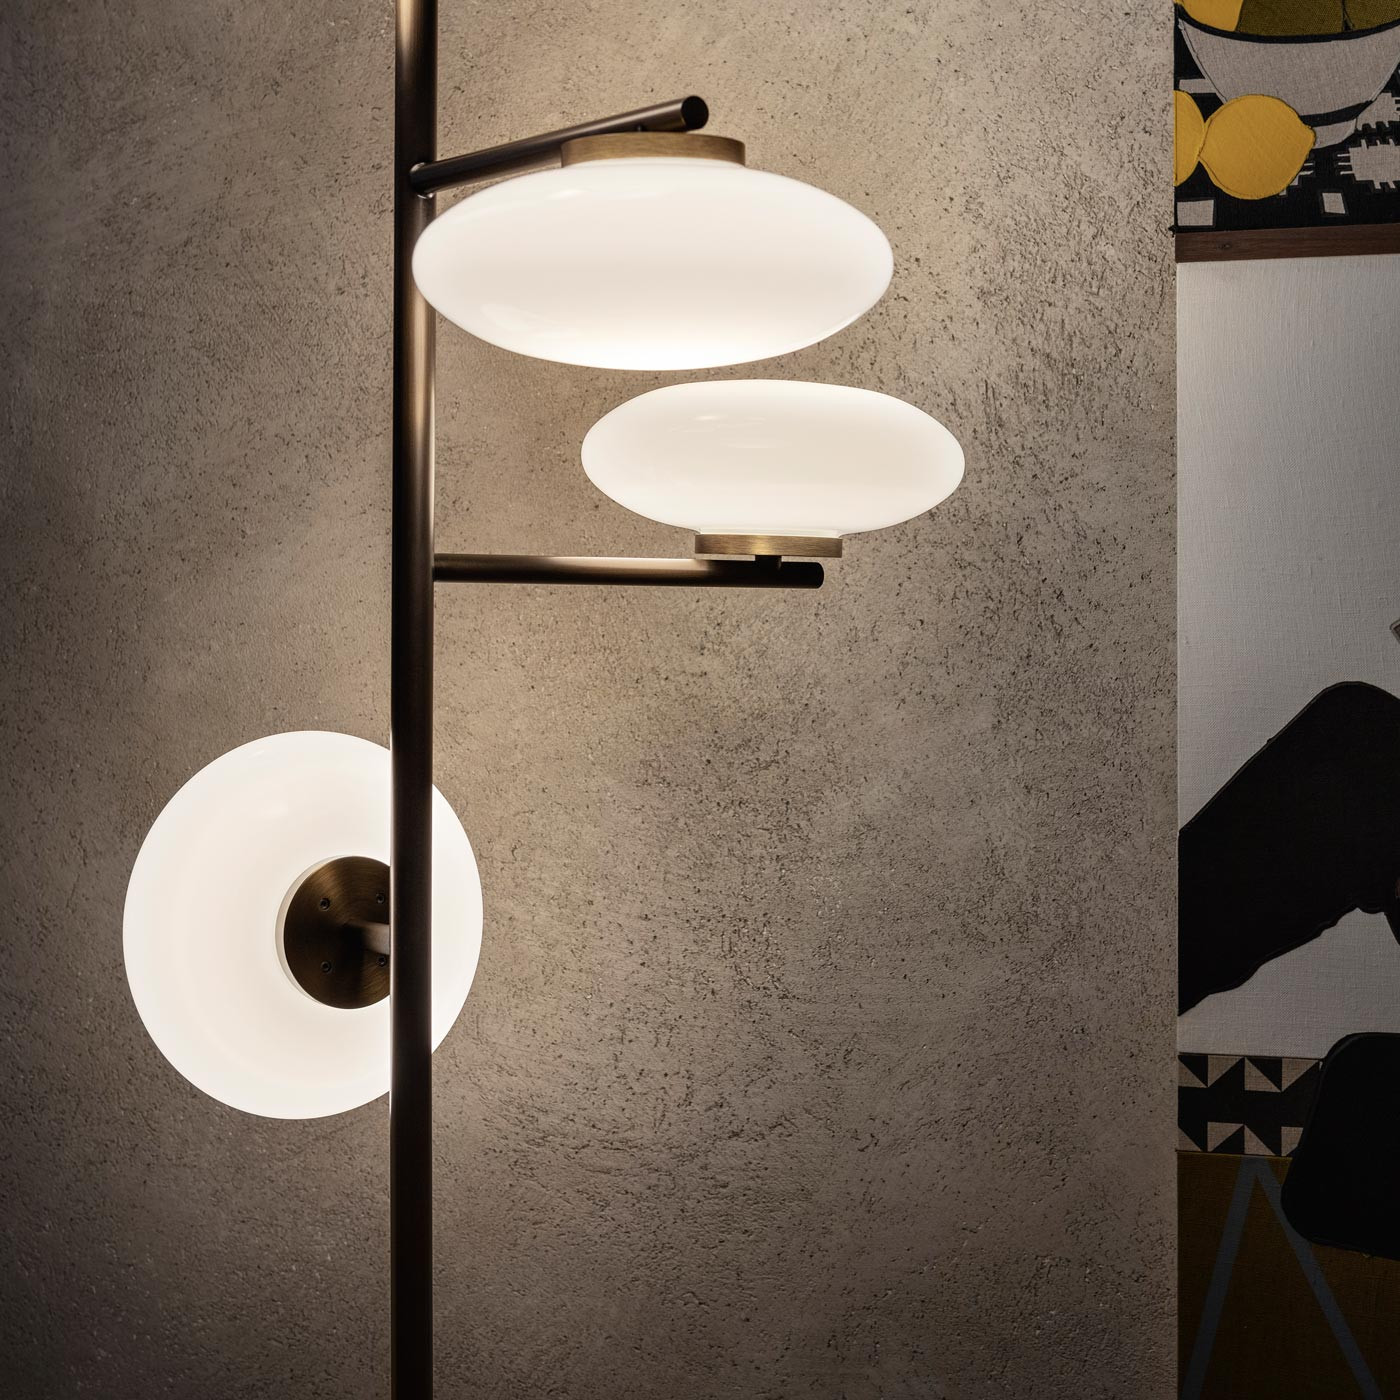 Ceiling To Floor Lamp Gallery @house2homegoods.net